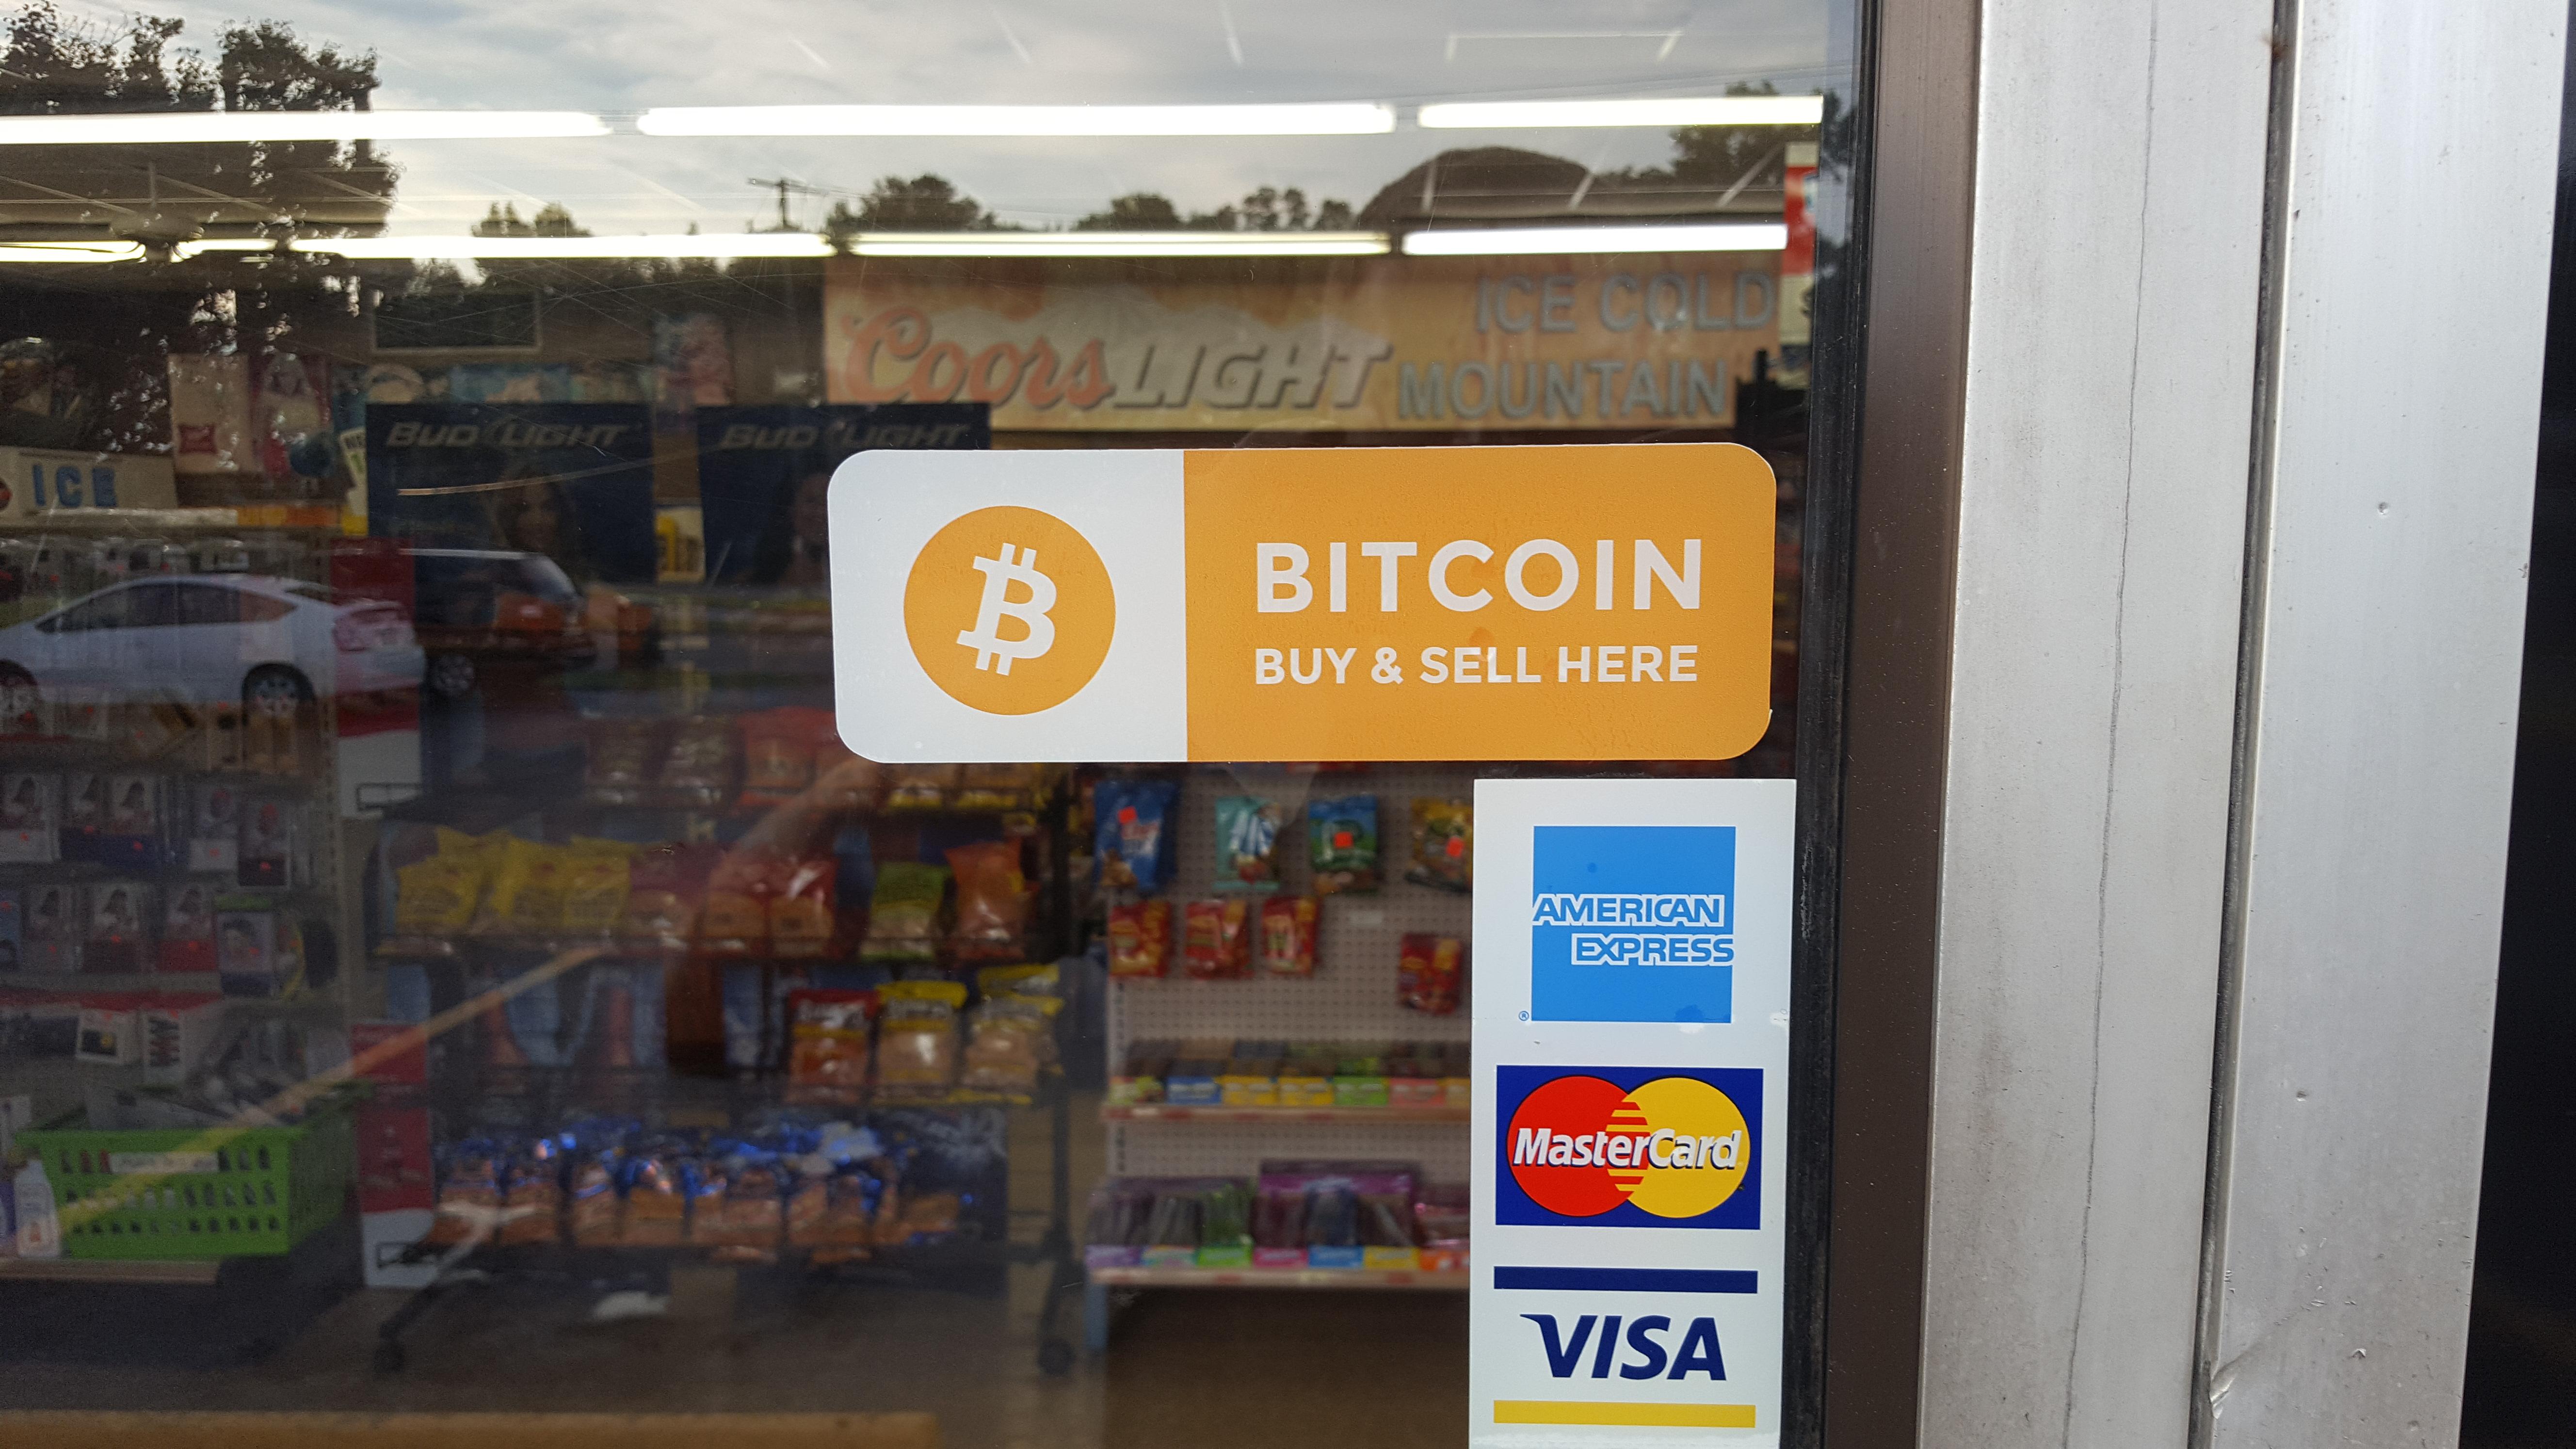 Bitcoin Buy Here